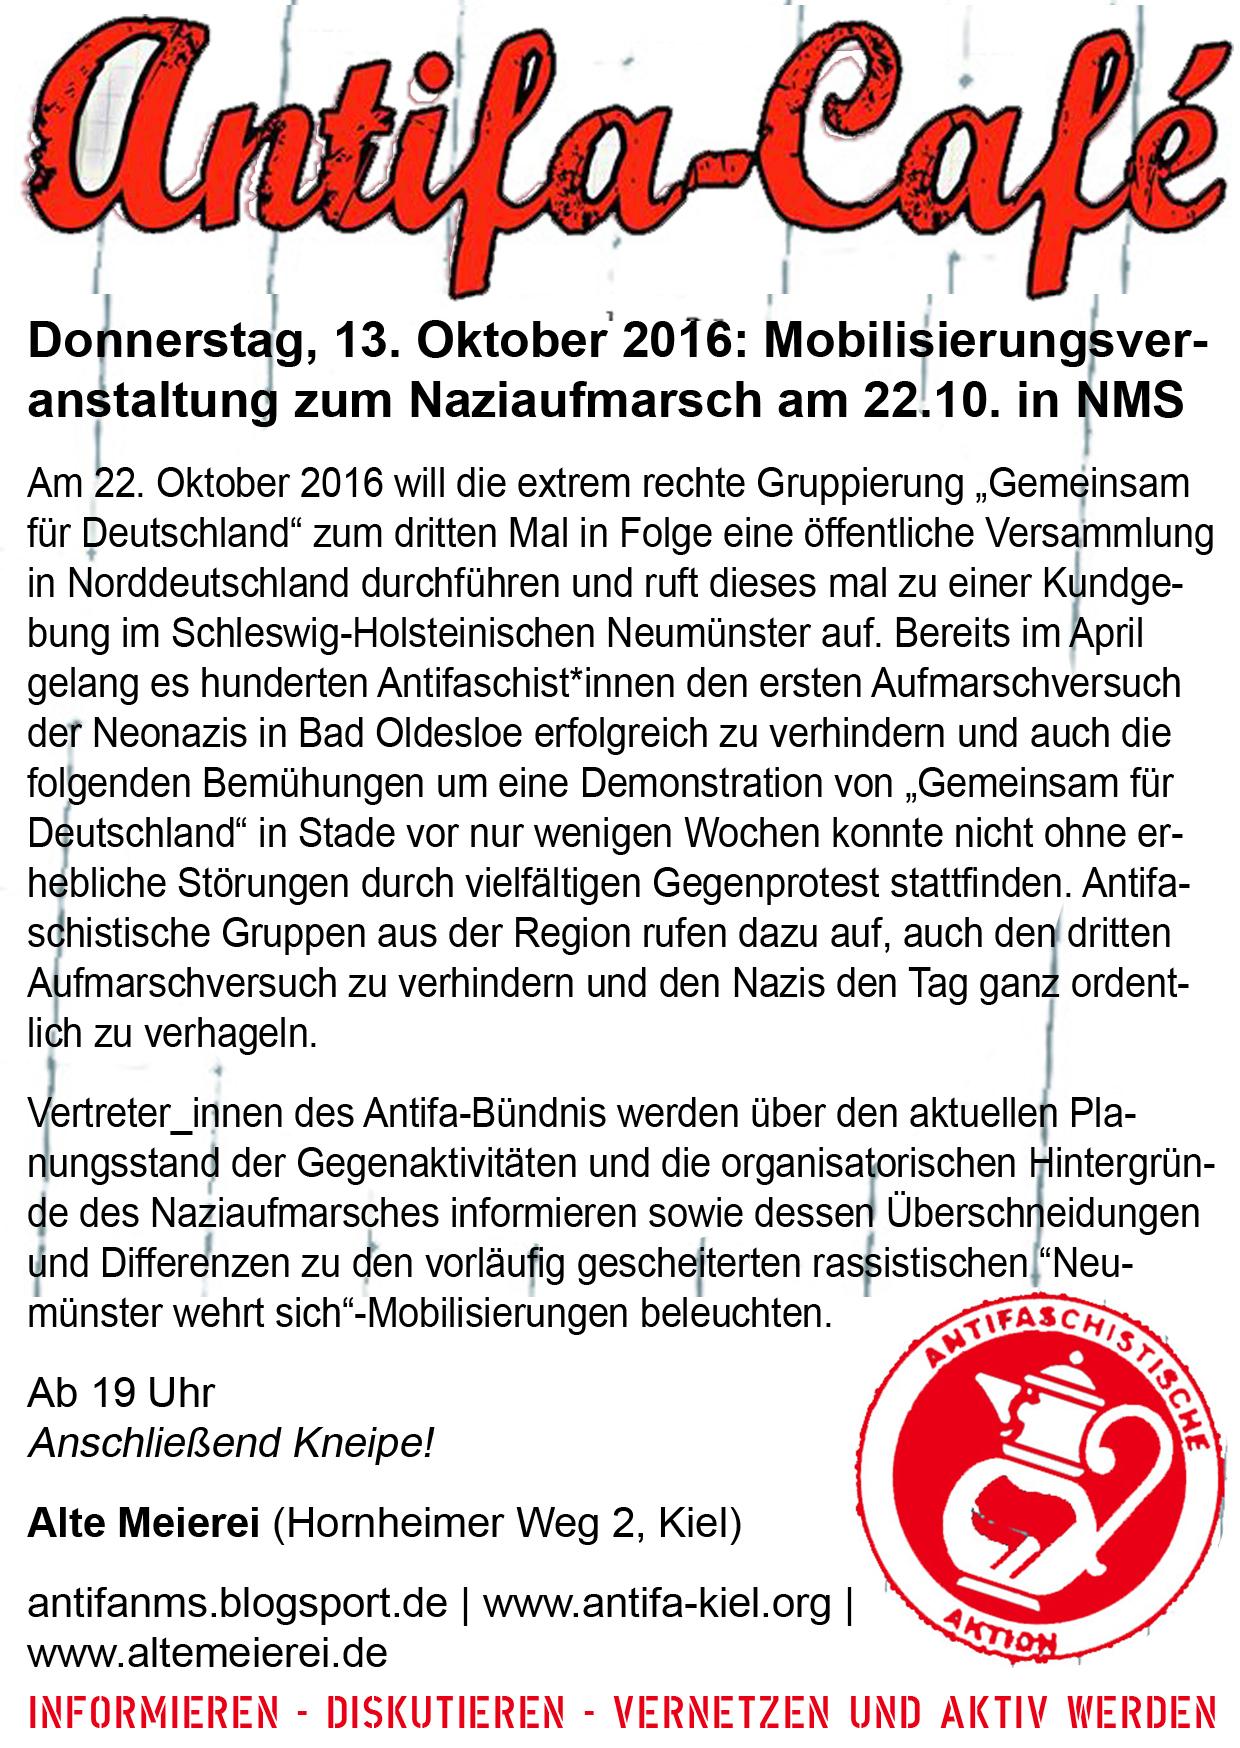 http://www.neu.antifa-kiel.org/wp-content/uploads/import/antifa-cafe/cafe_061016.jpg